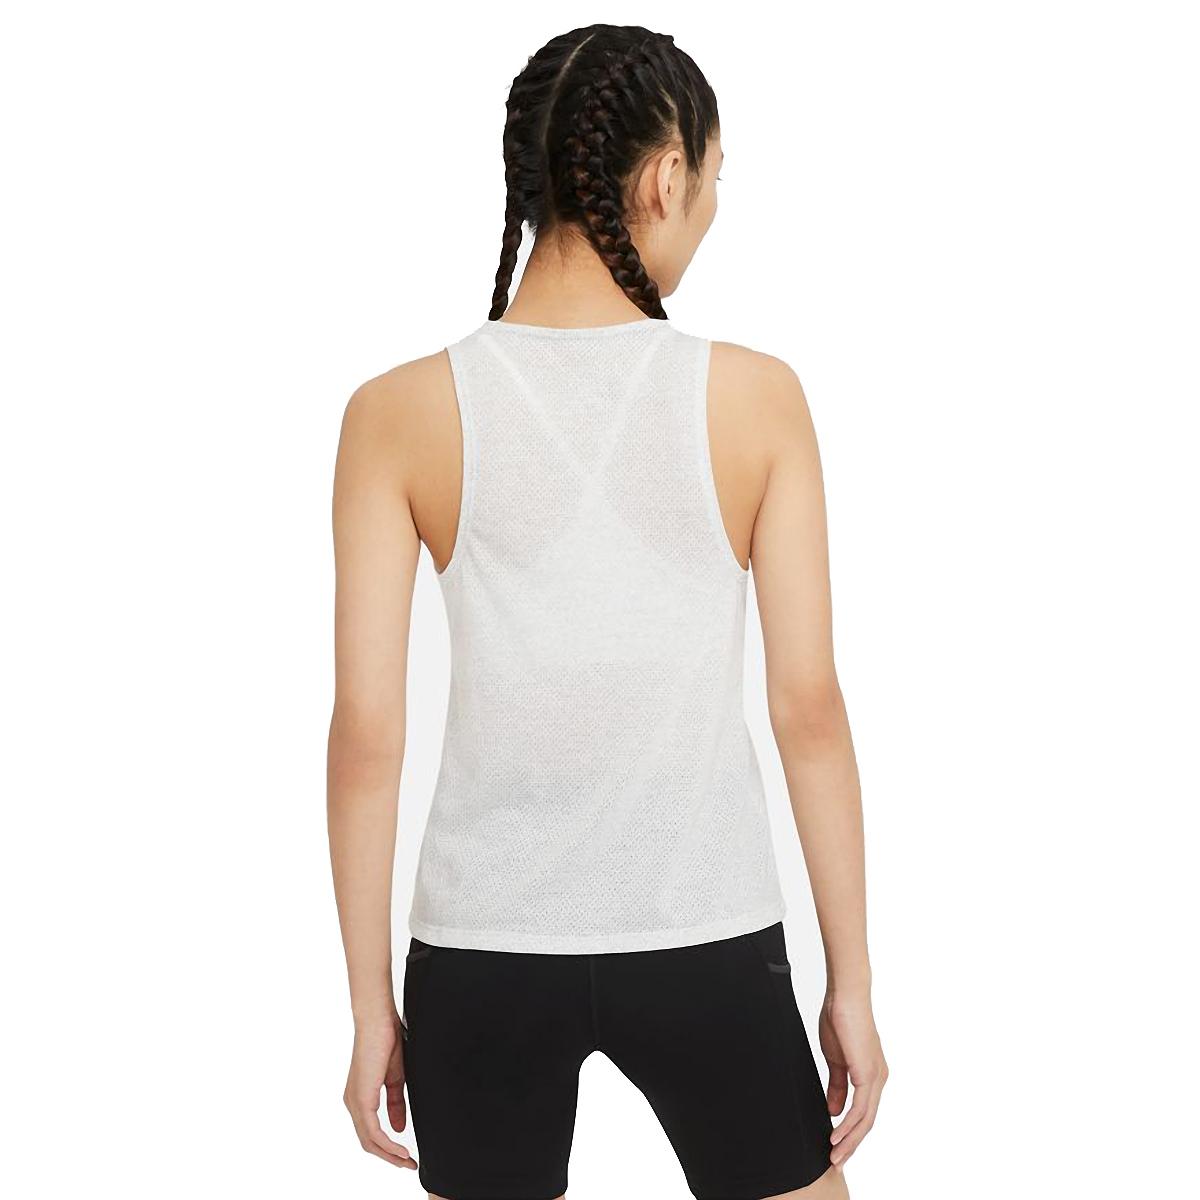 Women's Nike City Sleek Trail Running Tank - Color: Light Smoke Grey/Grey Fog/Reflective Silver - Size: XS, Light Smoke Grey/Grey Fog/Reflective Silver, large, image 2